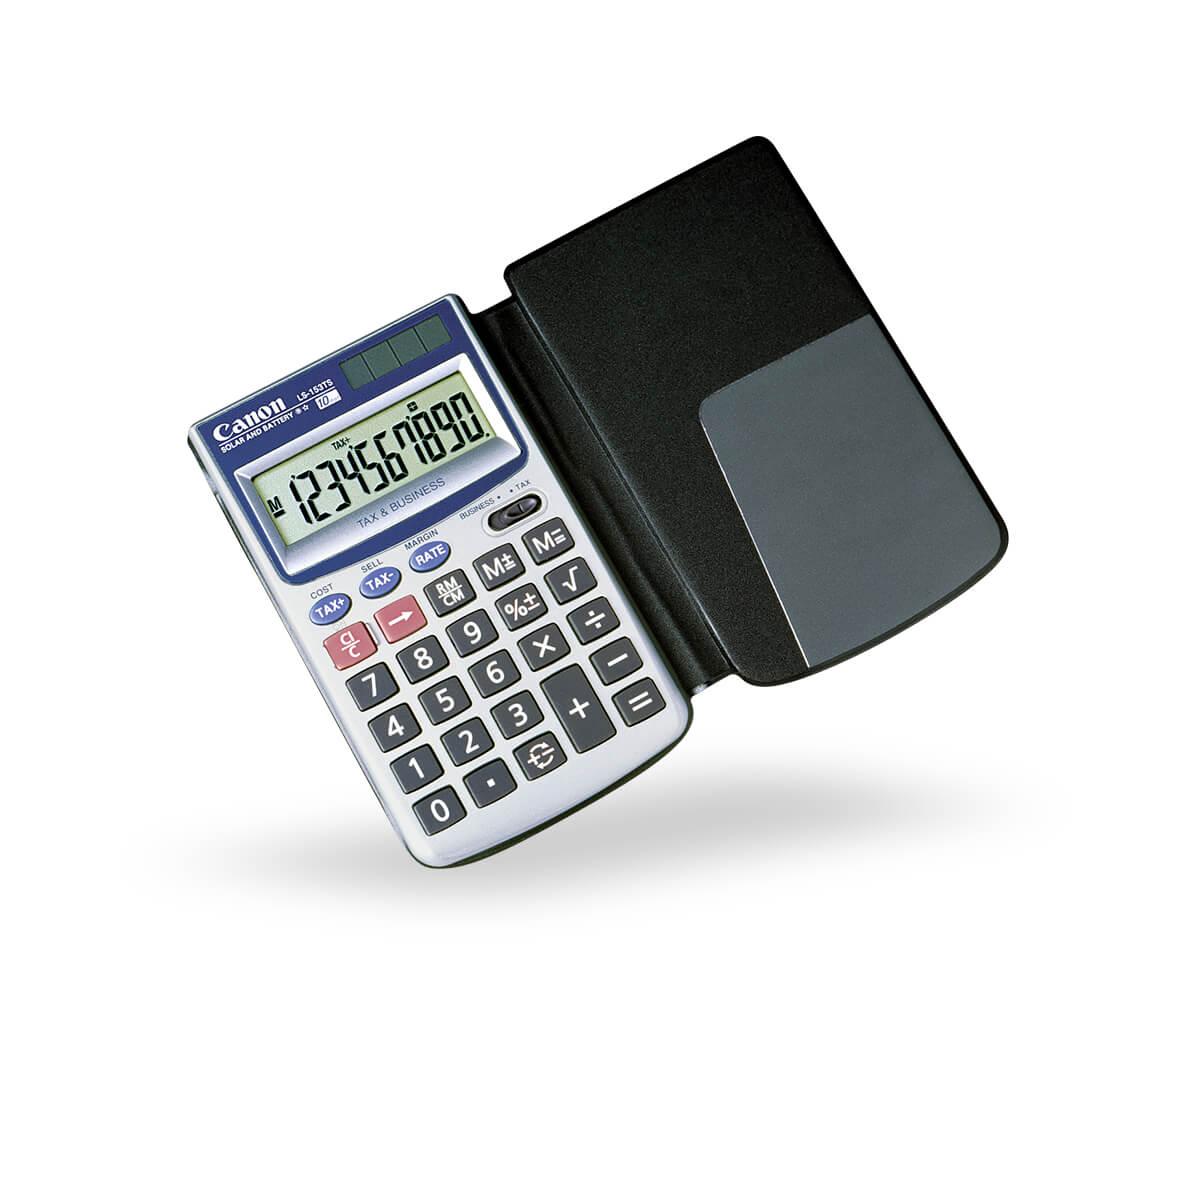 Canon LS-153TS business pocket calculator